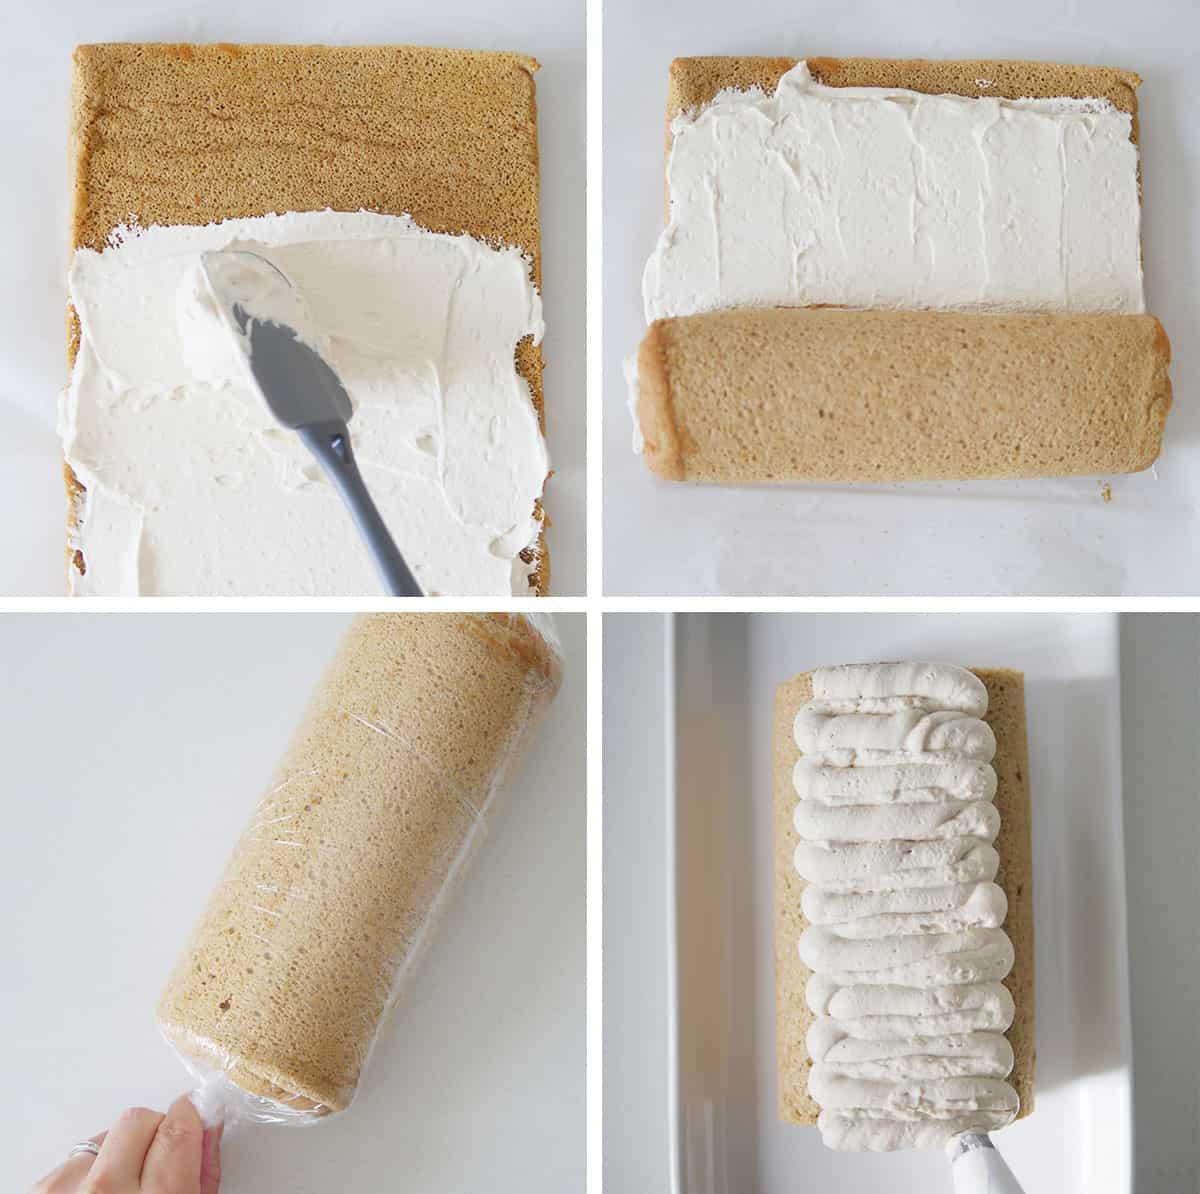 adding coffee cream to the cake roll